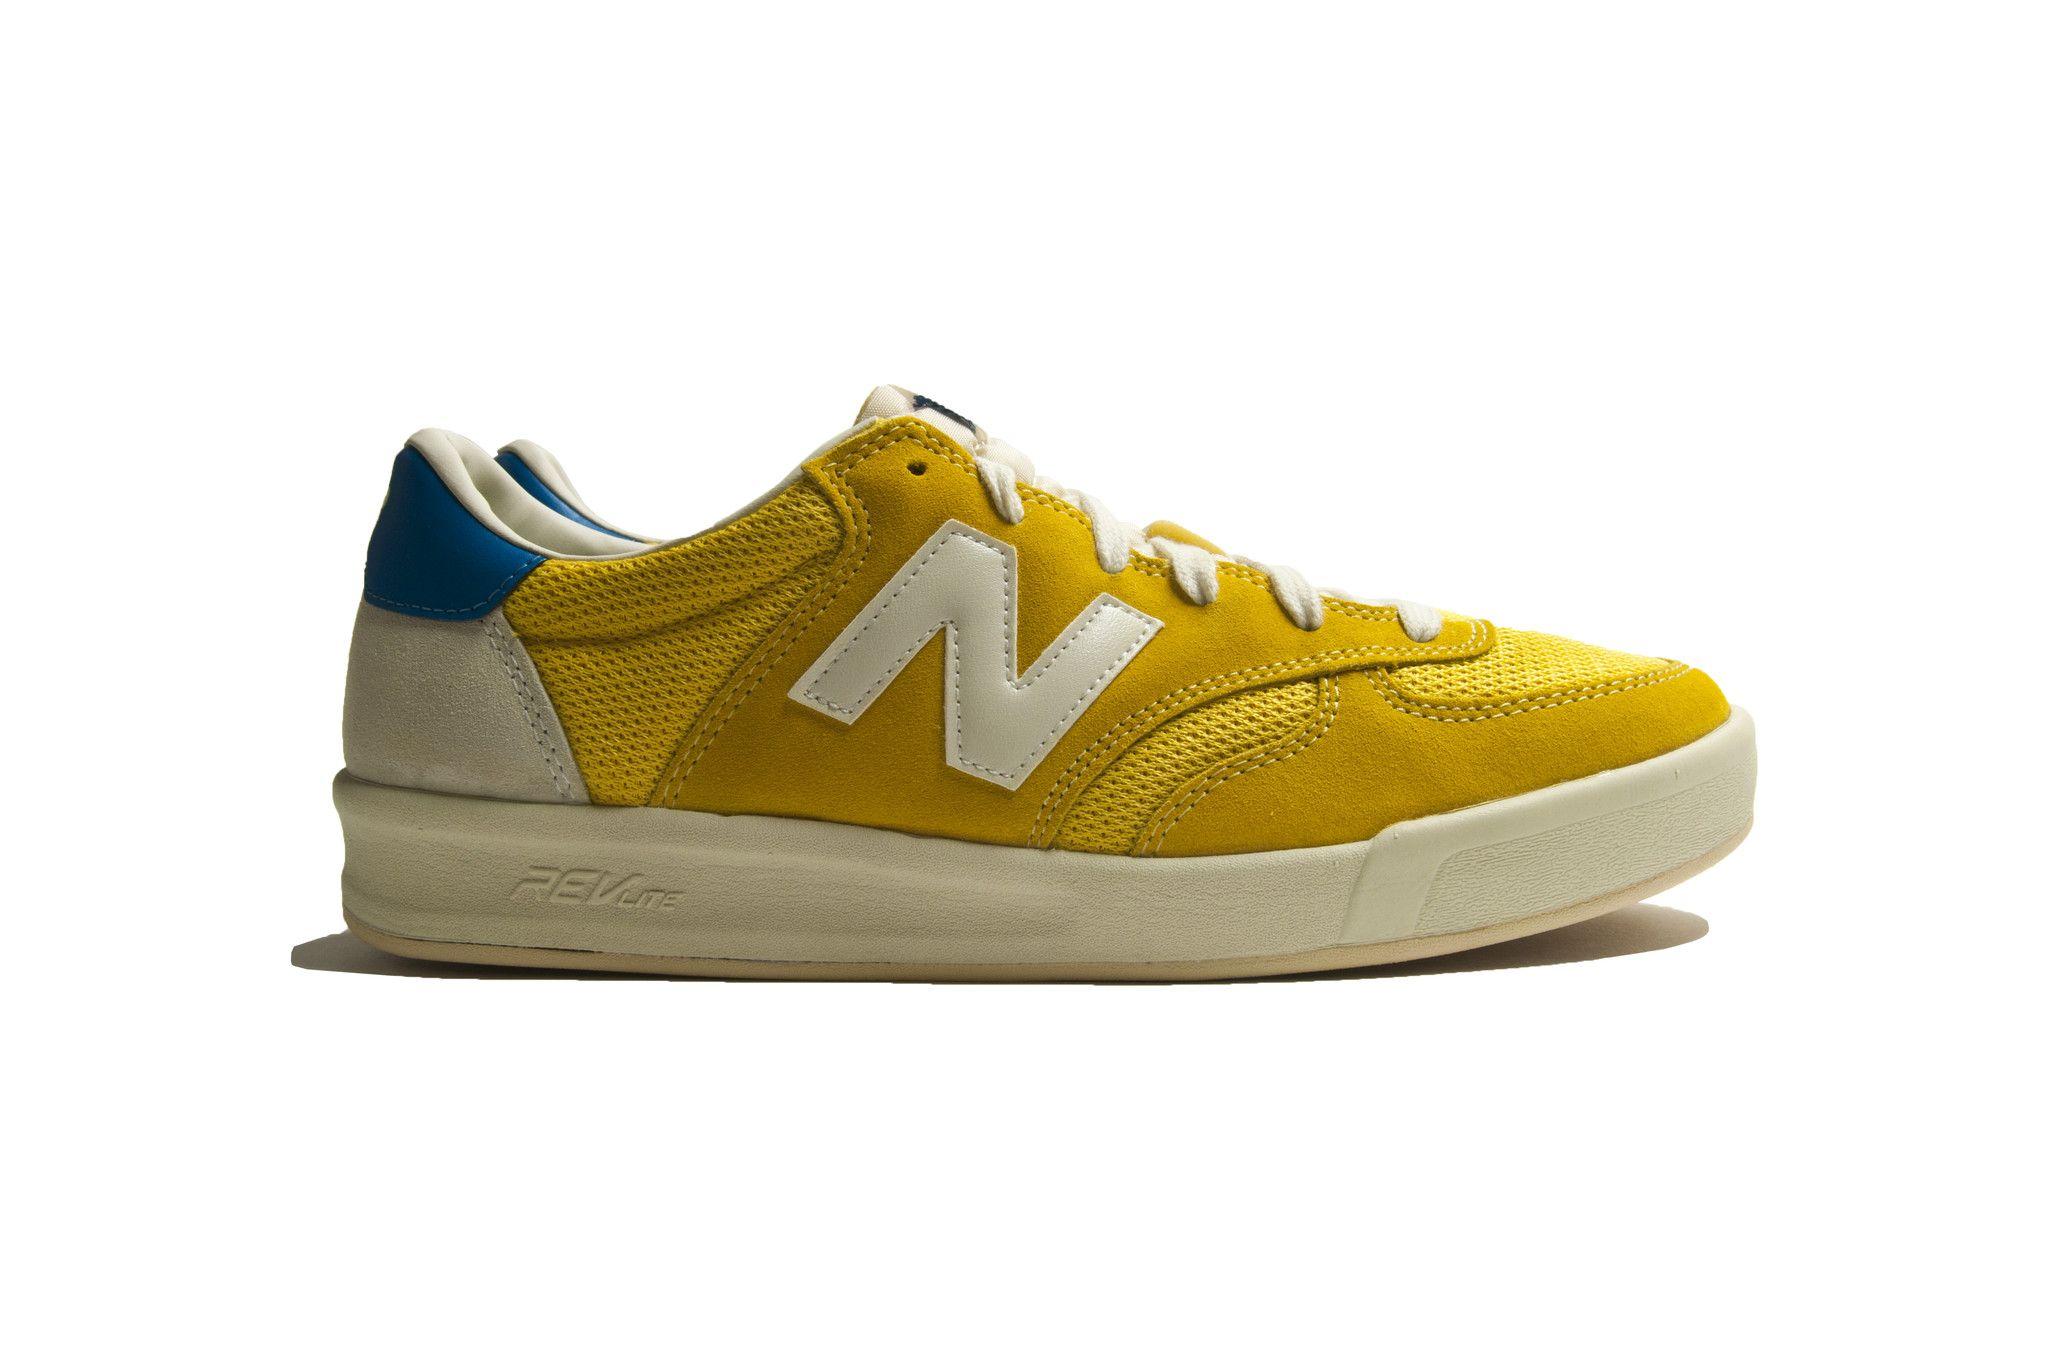 new balance crt300 revlite yellow shoes pinterest men 39 s fashion. Black Bedroom Furniture Sets. Home Design Ideas